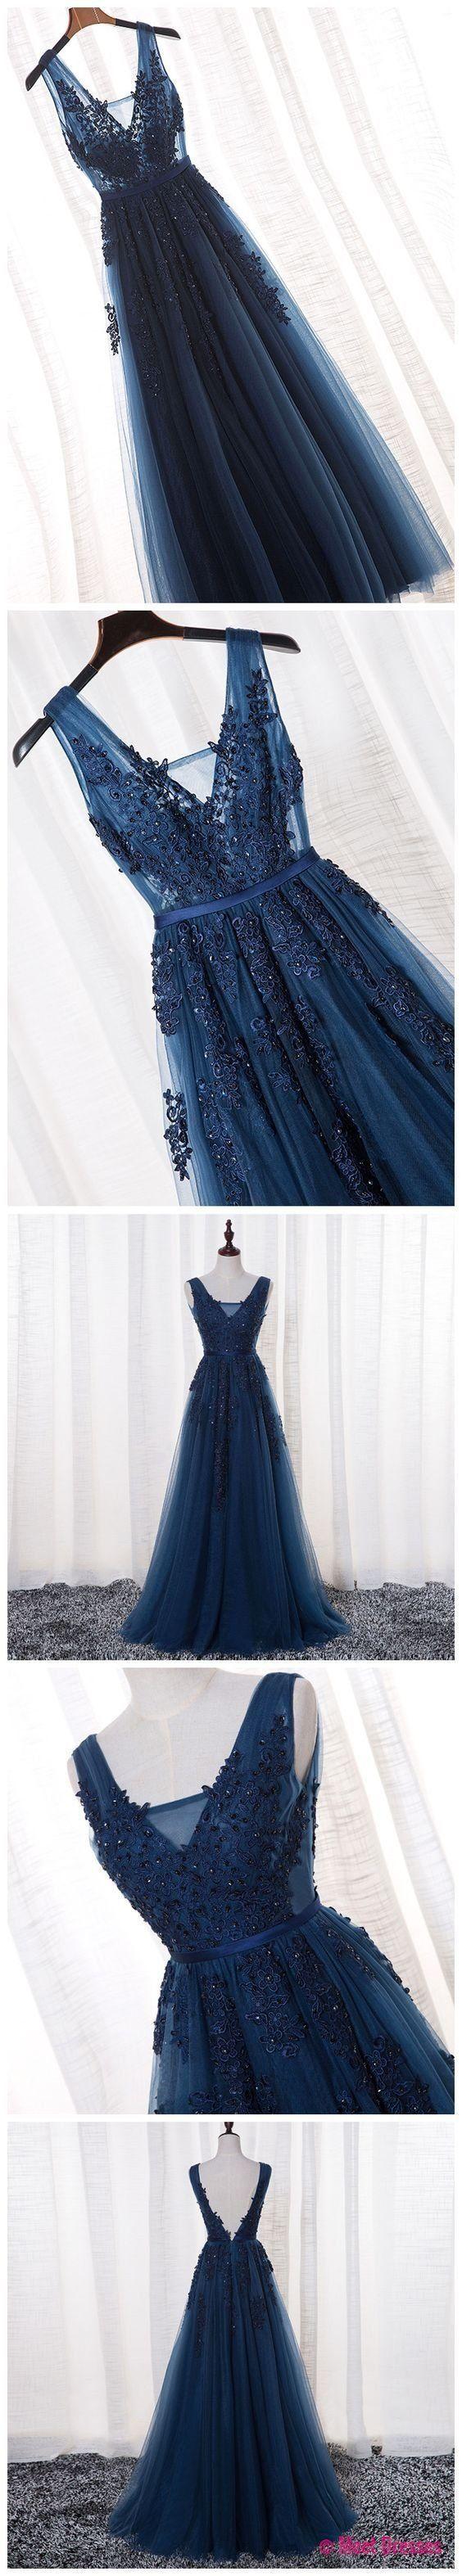 Long Prom Dress , Beaded Prom Dresses,Graduation Party Dresses, Prom Dresses For Teens PD20188660